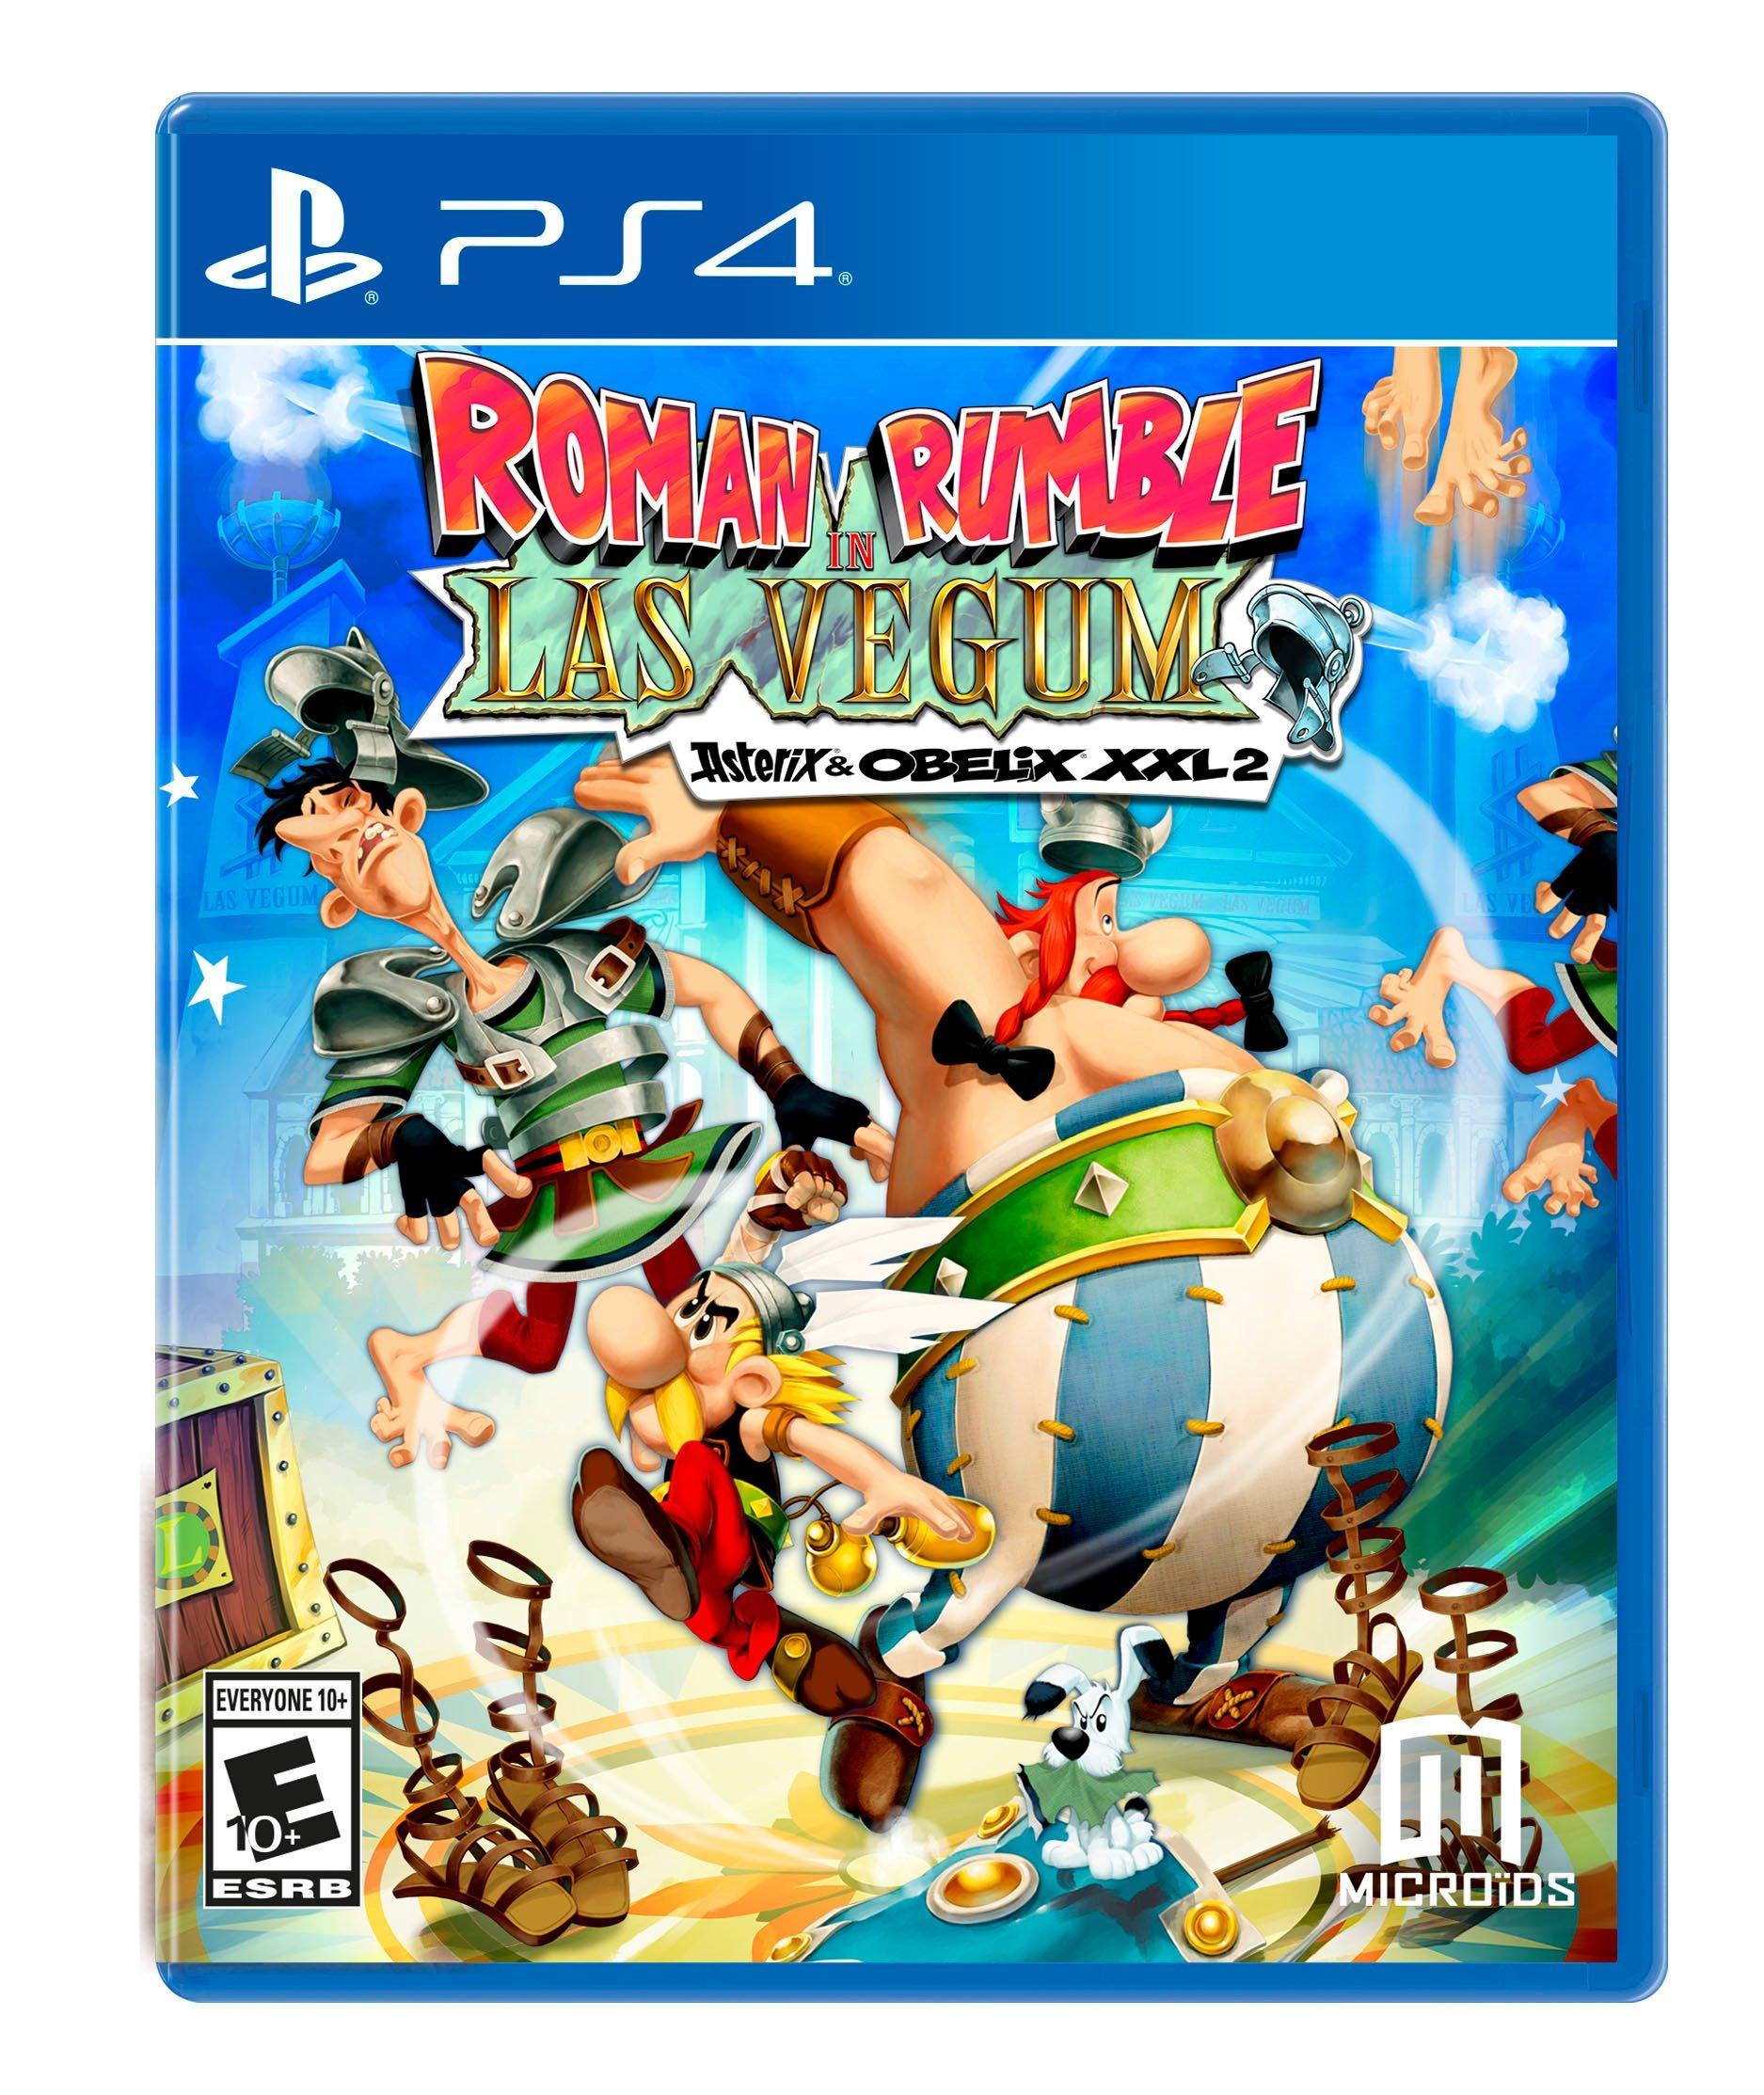 Roman Rumble in Las Vegum: Asterix and Obelix XXL 2 (PS4/Xbox One) $8 at GameStop